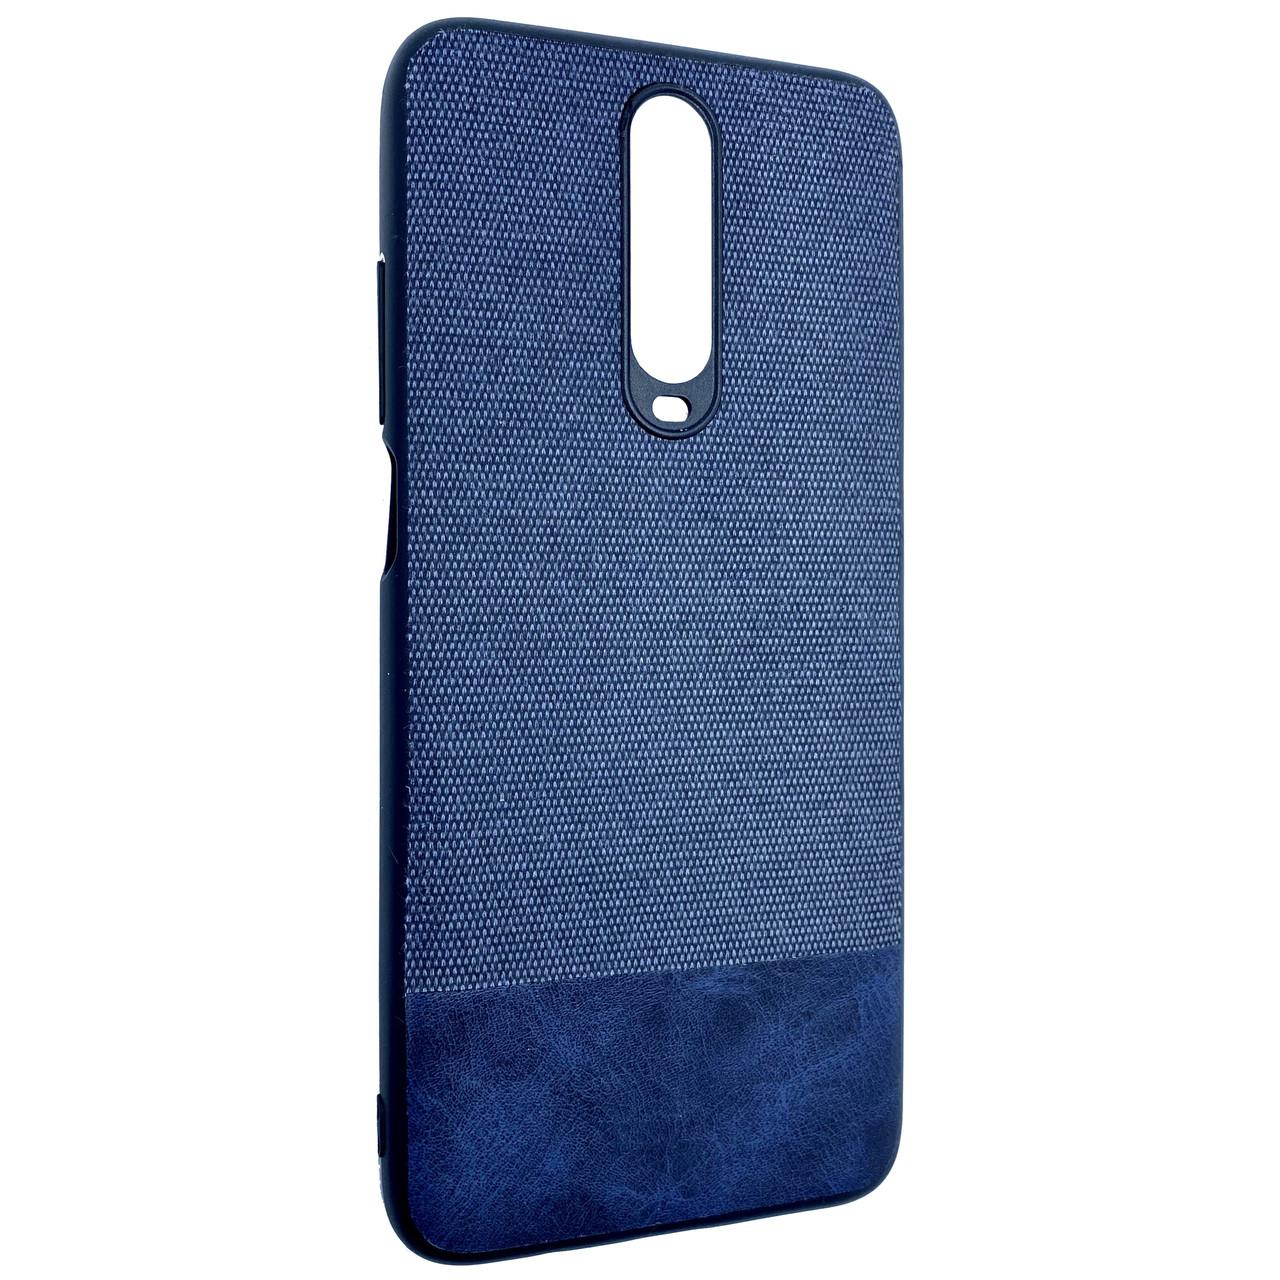 Чехол DK Silicone Form Fabric Cotton Xiaomi Mi 10T / Redmi K30 (blue)